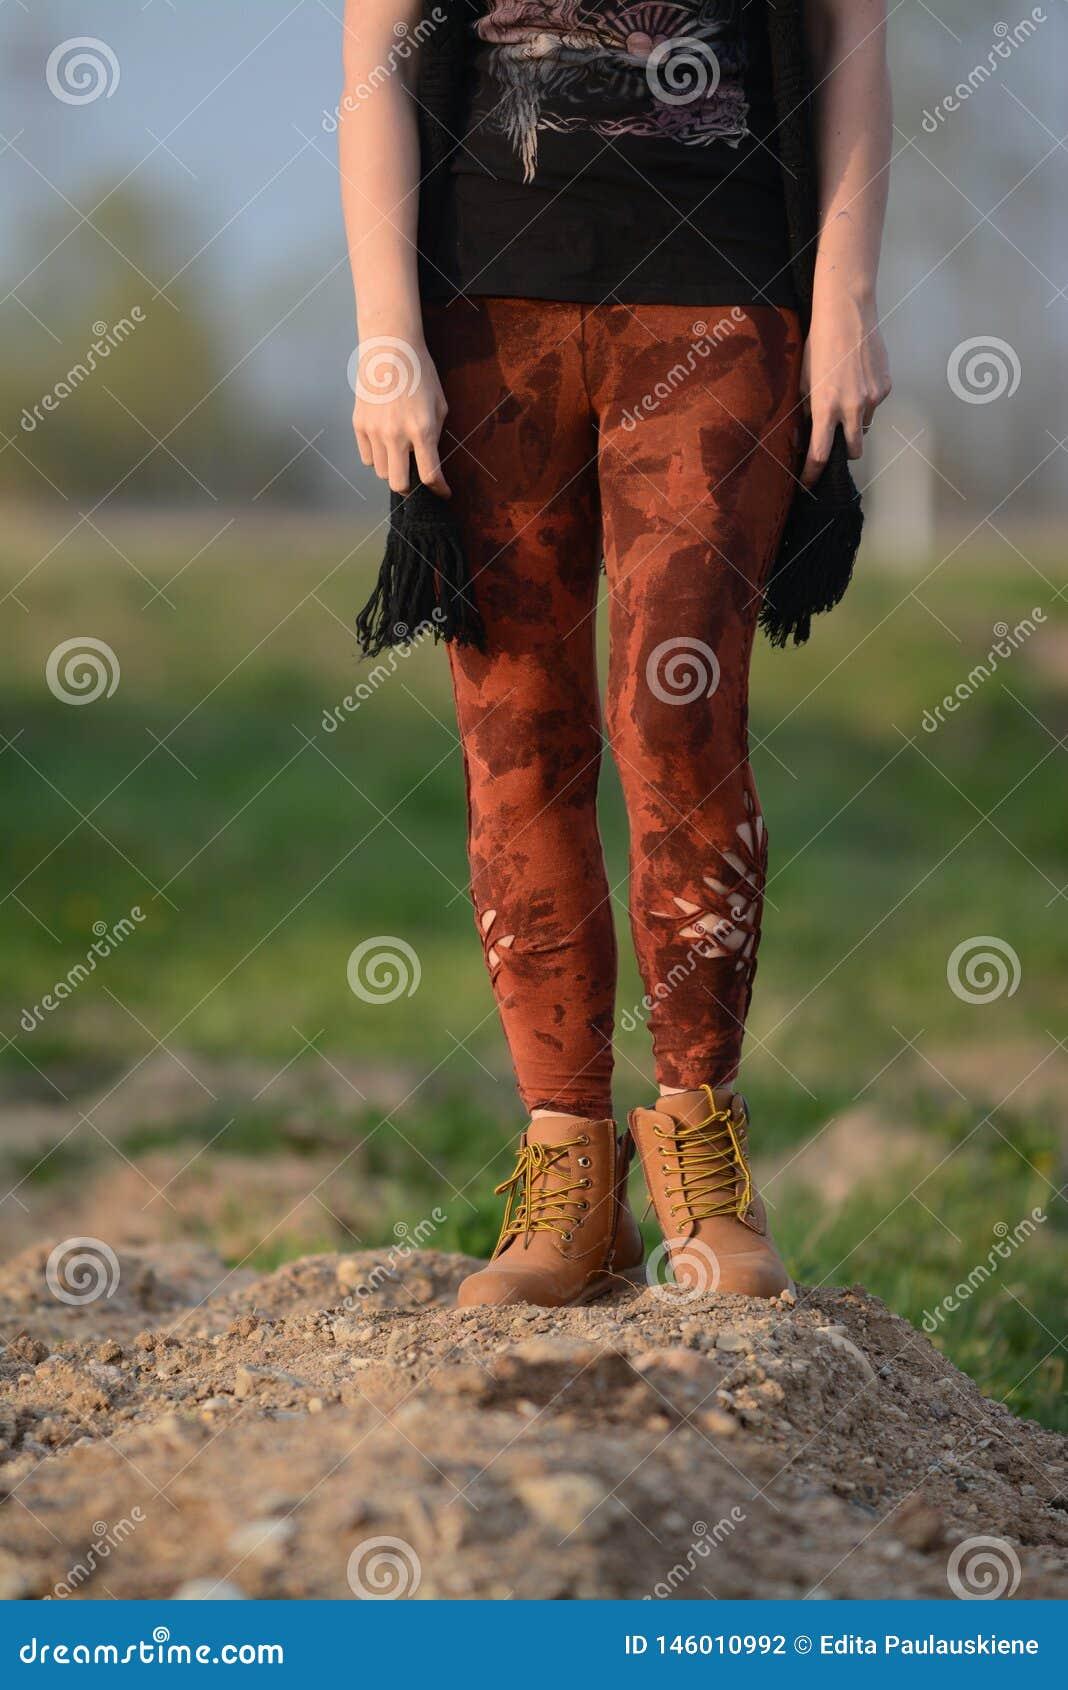 Gambe in belle e calzamaglia tagliate uniche, modo di festival, ora dorata, sera calda